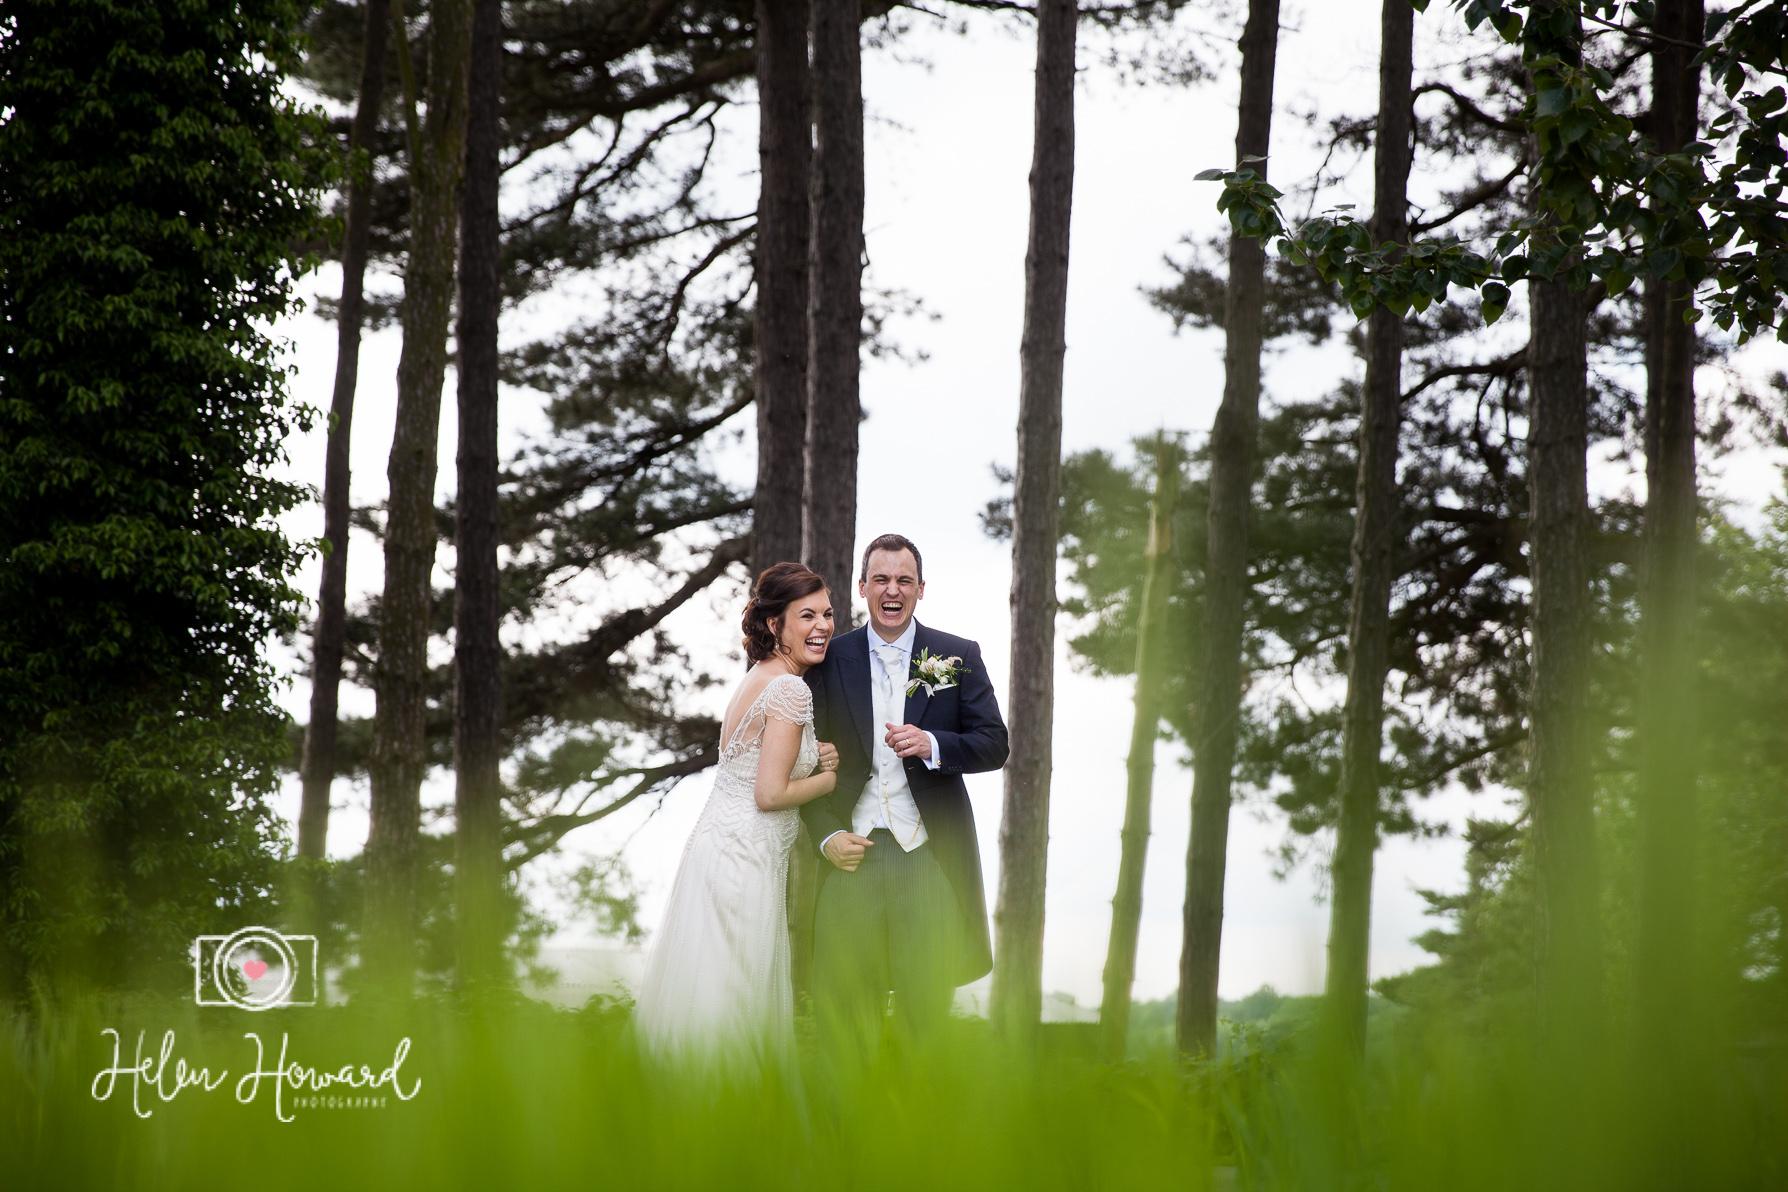 Helen Howard Photography Packington Moor Wedding-79.jpg